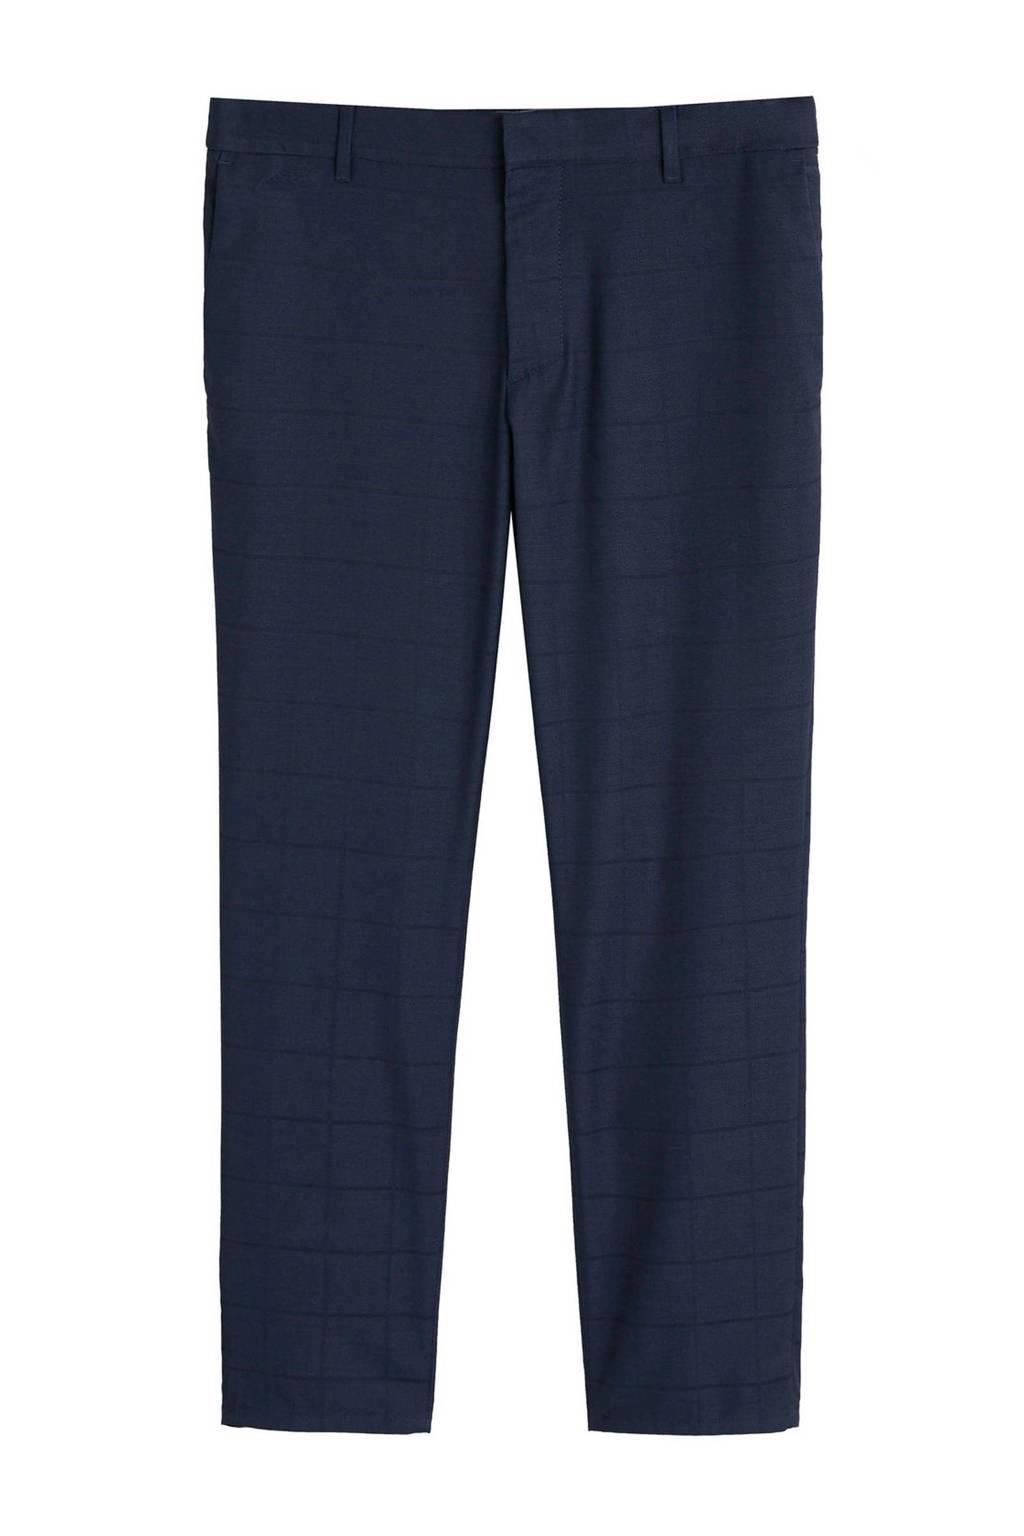 Mango Man slim fit pantalon met all over print, Donkerblauw